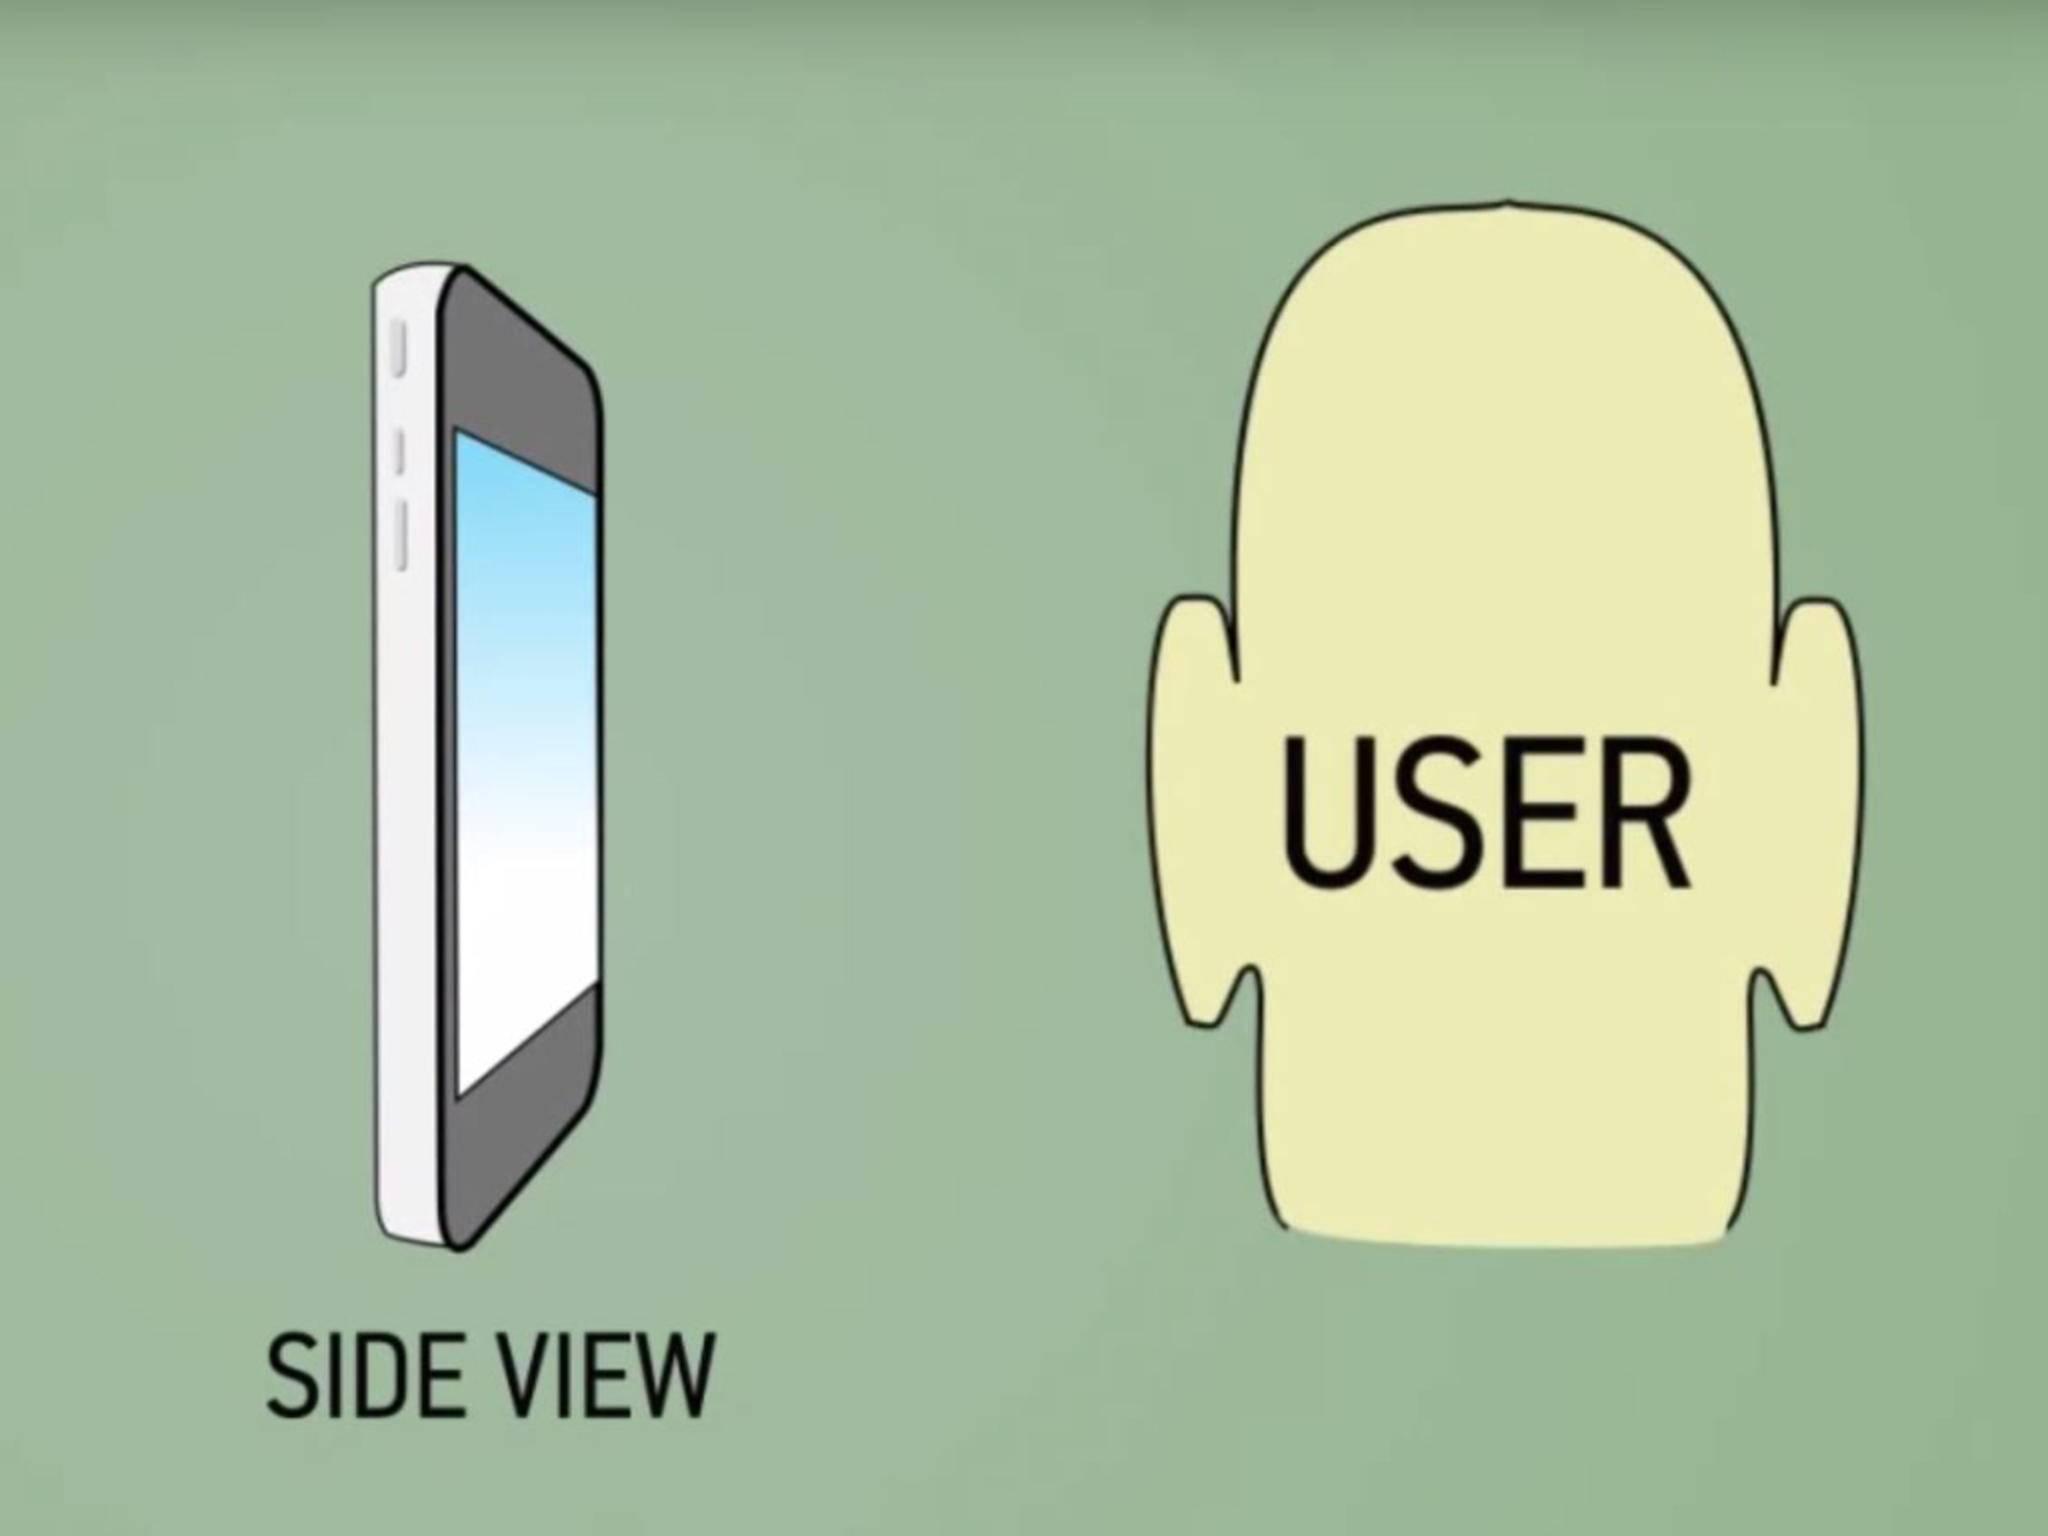 Scannen Smartphones künftig Ohren statt Finger?